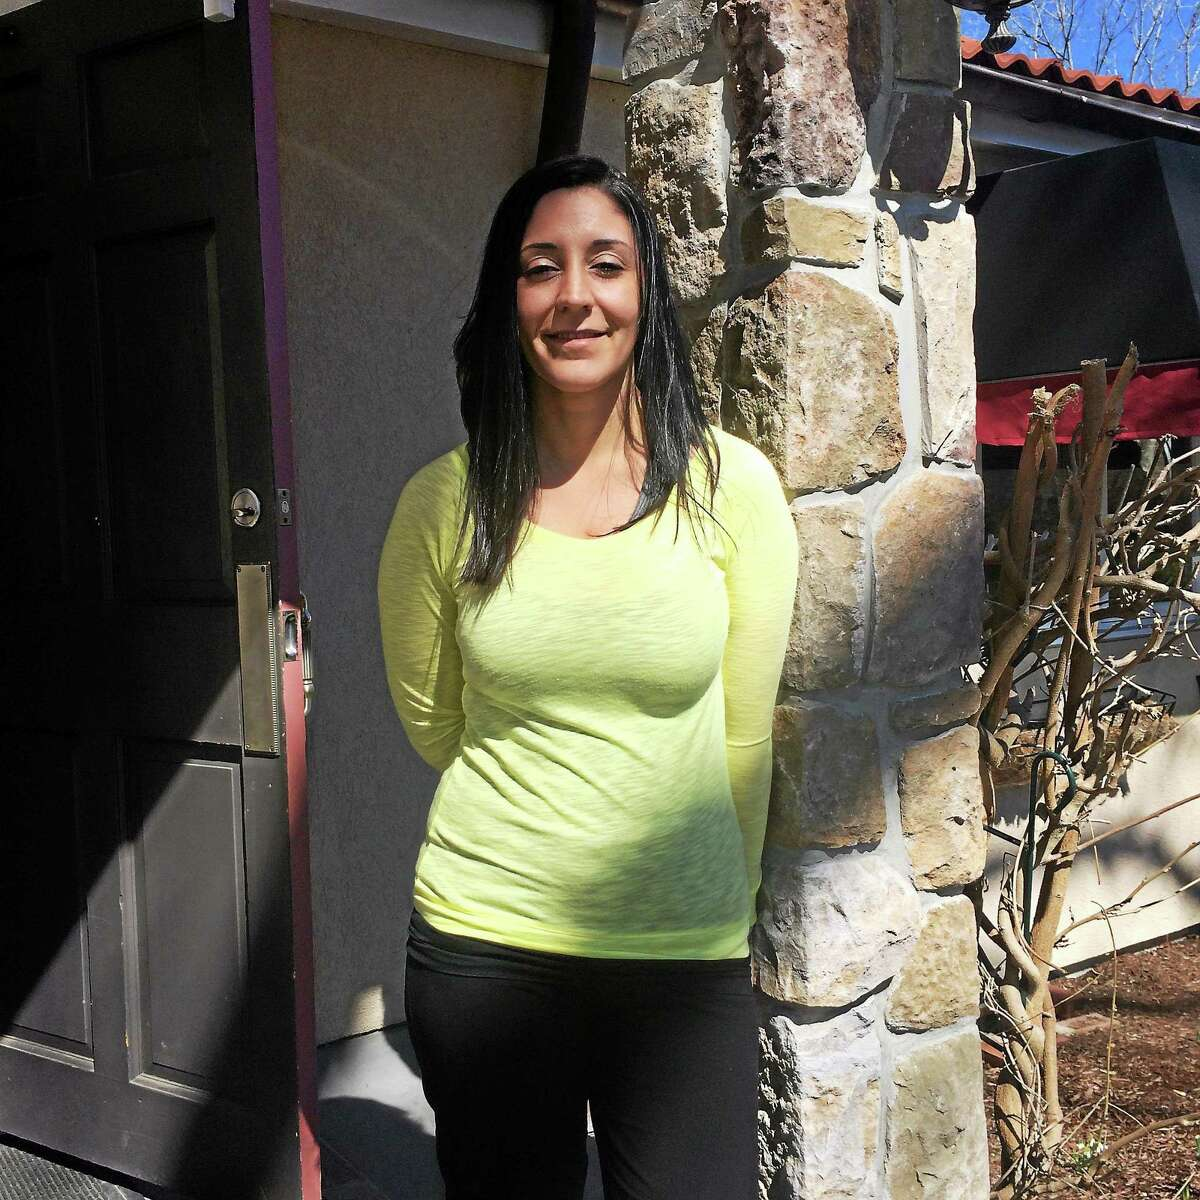 Angela Ciriello, co-owner of 1 Twenty Two Restaurant in New Milford.